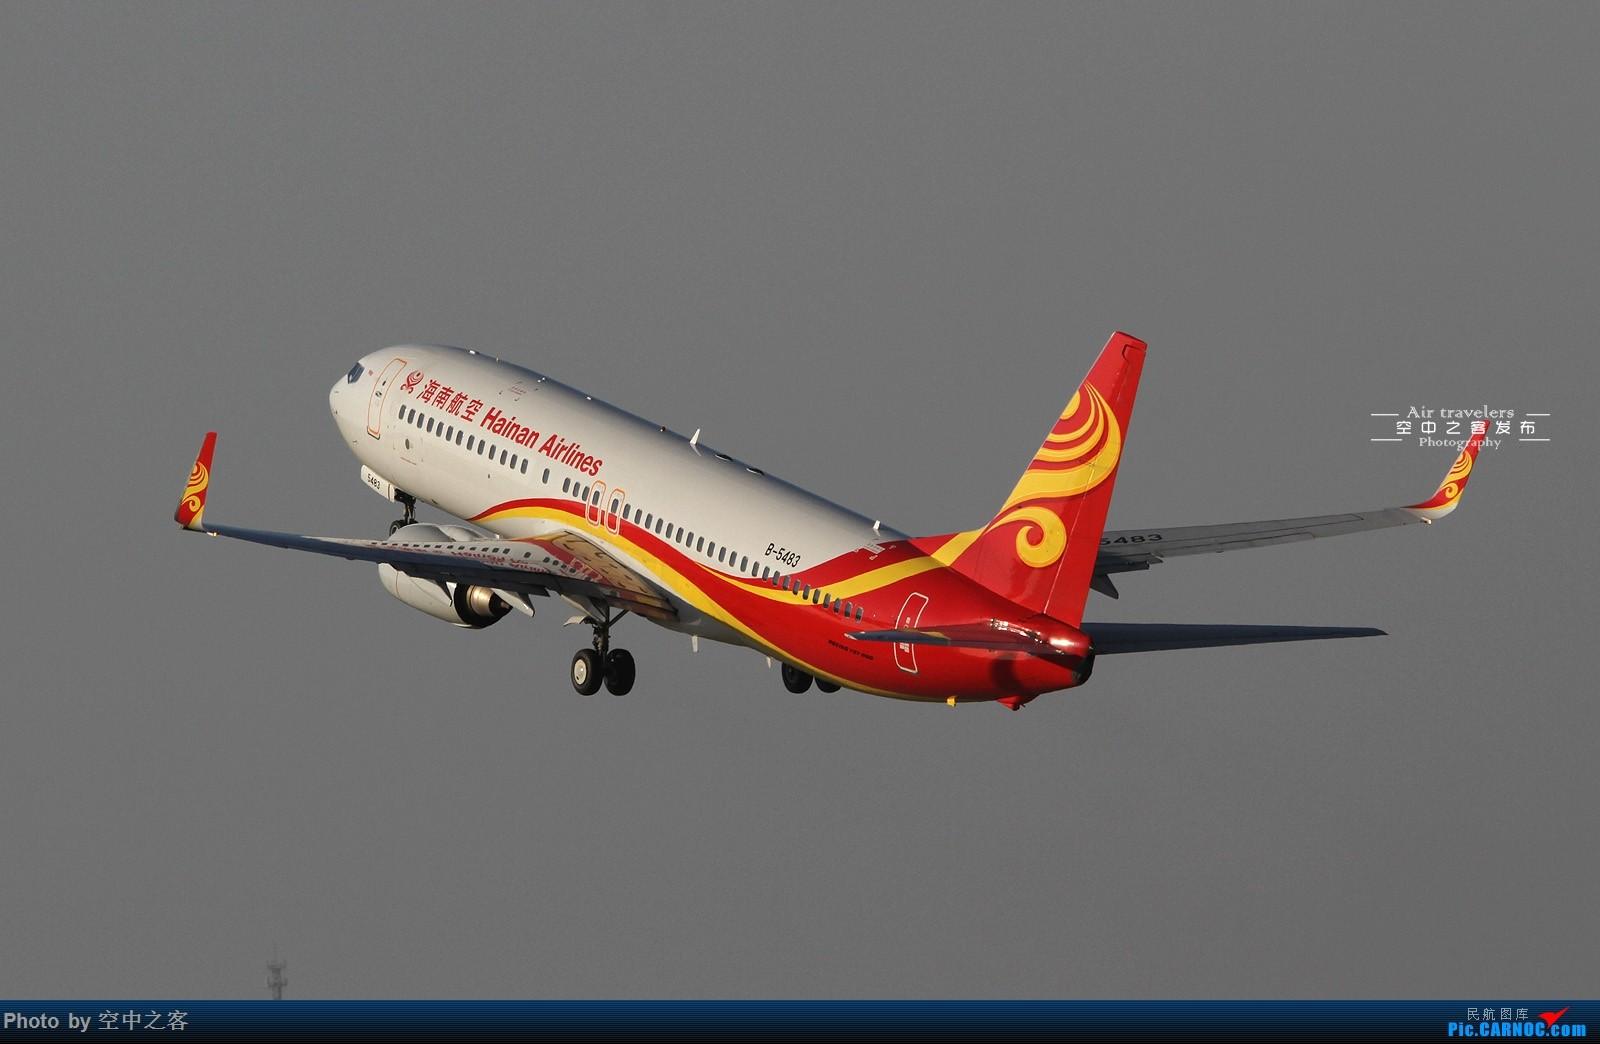 Re:[原创][合肥飞友会-霸都打机队 空中之客发布]去新桥机场散散心 738居多 BOEING 737-800 B-5483 合肥新桥国际机场